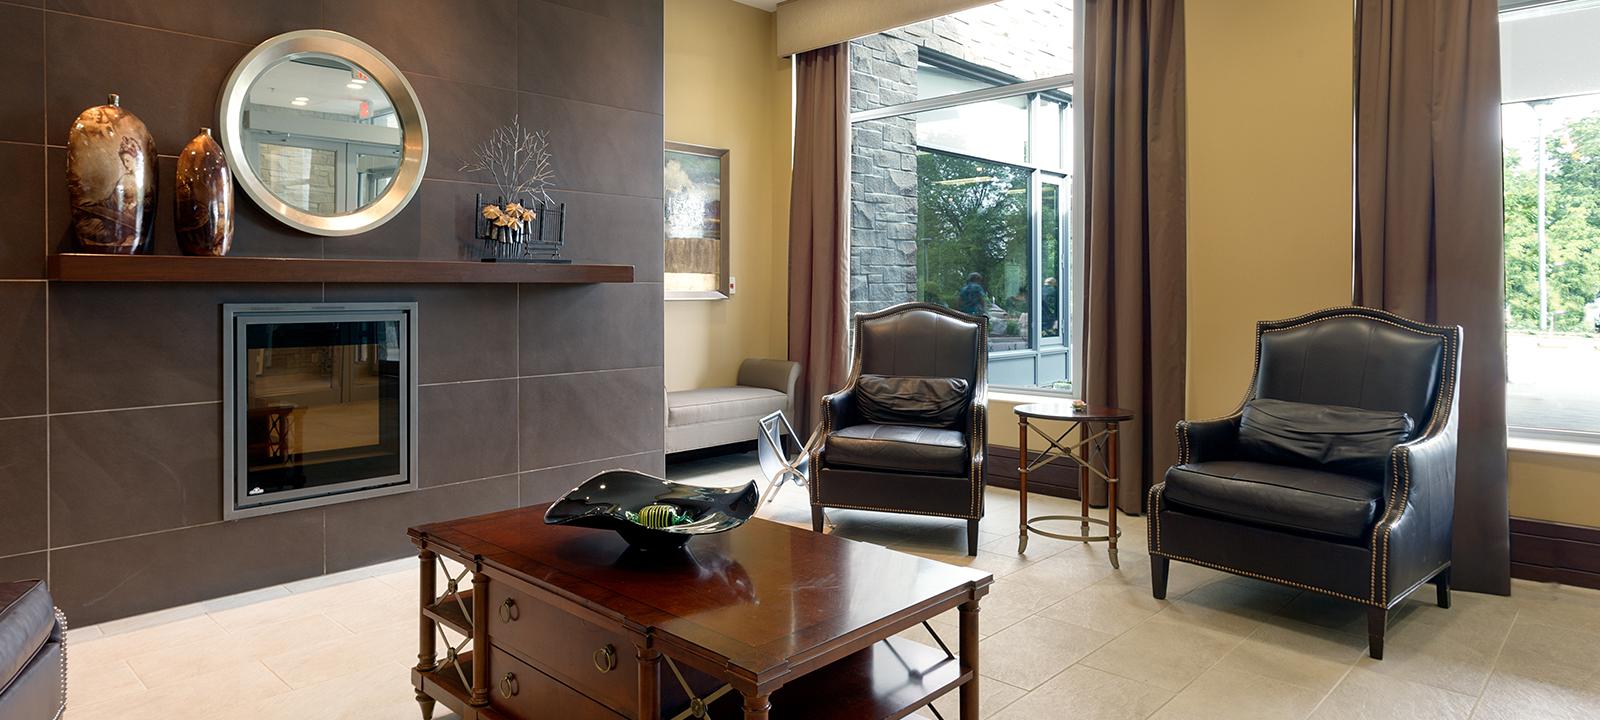 Common lounge at Amica Riverside senior living residence.